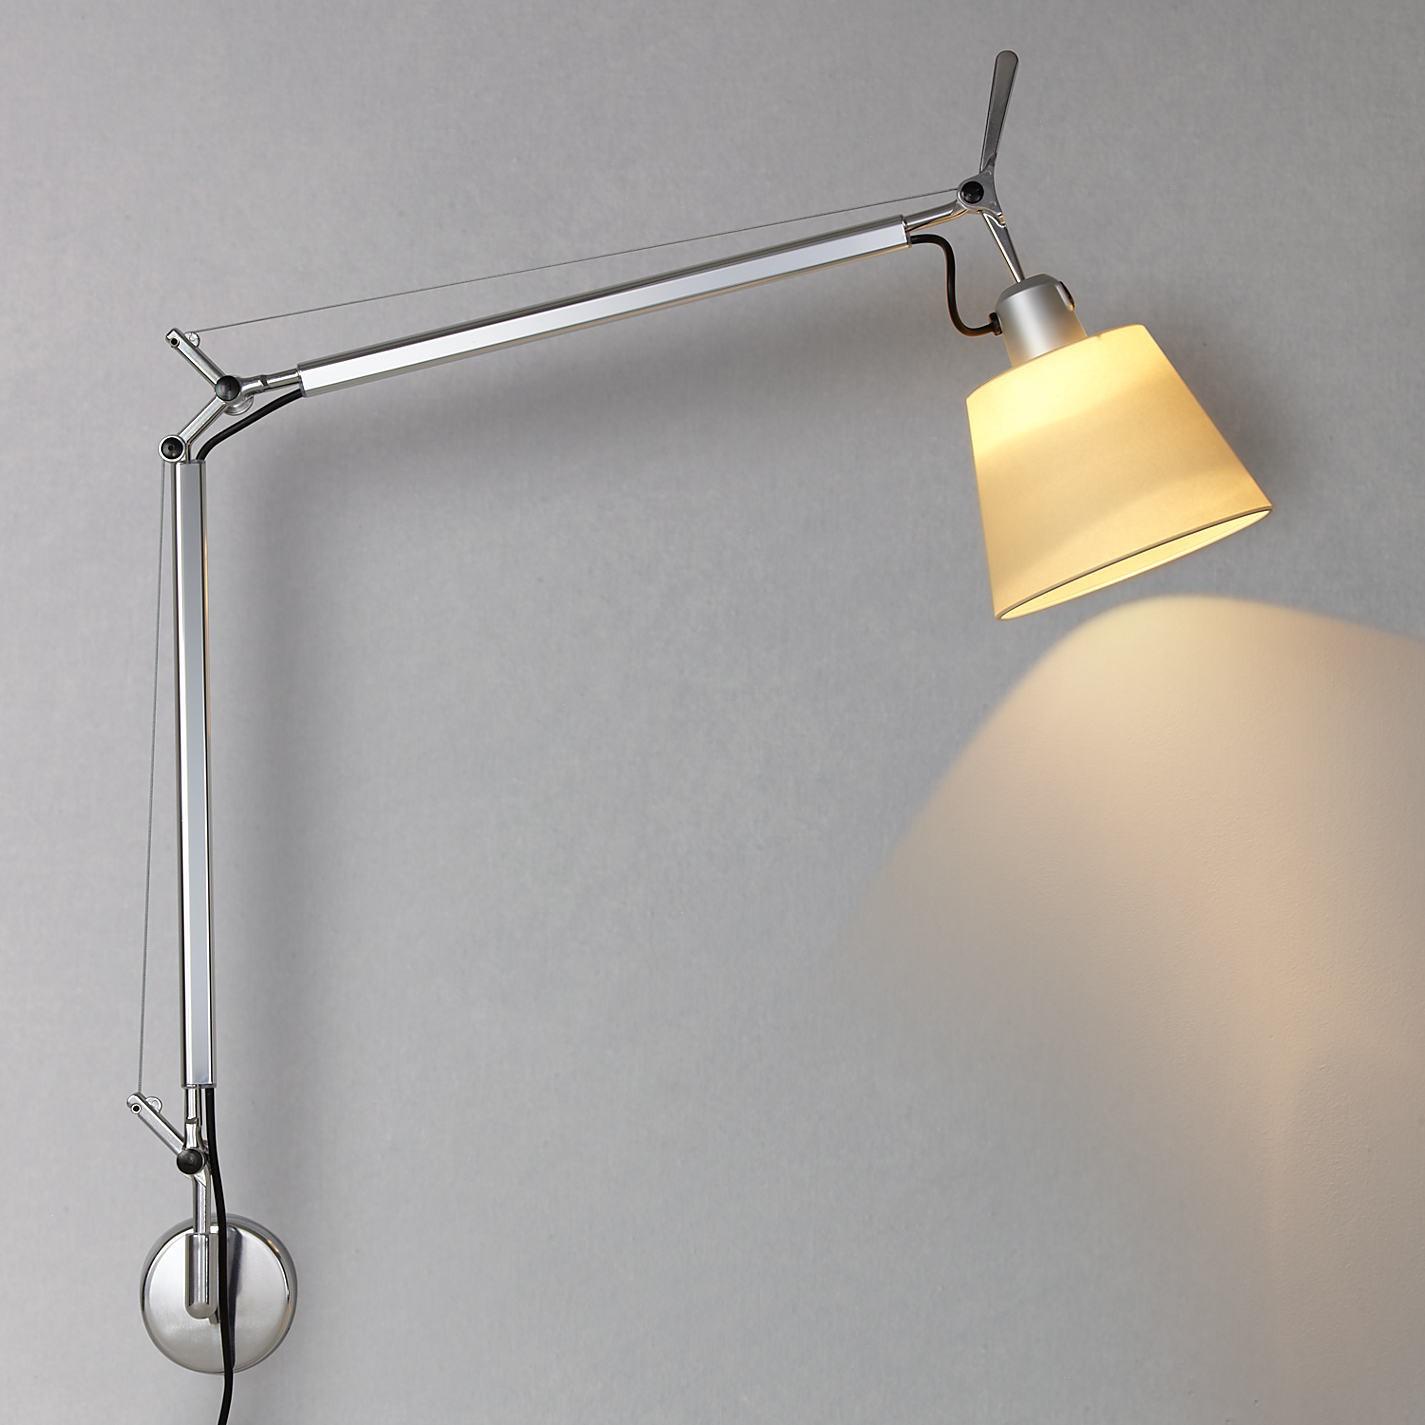 Tolomeo Basculante Lampada A Parete Artemide Acquista